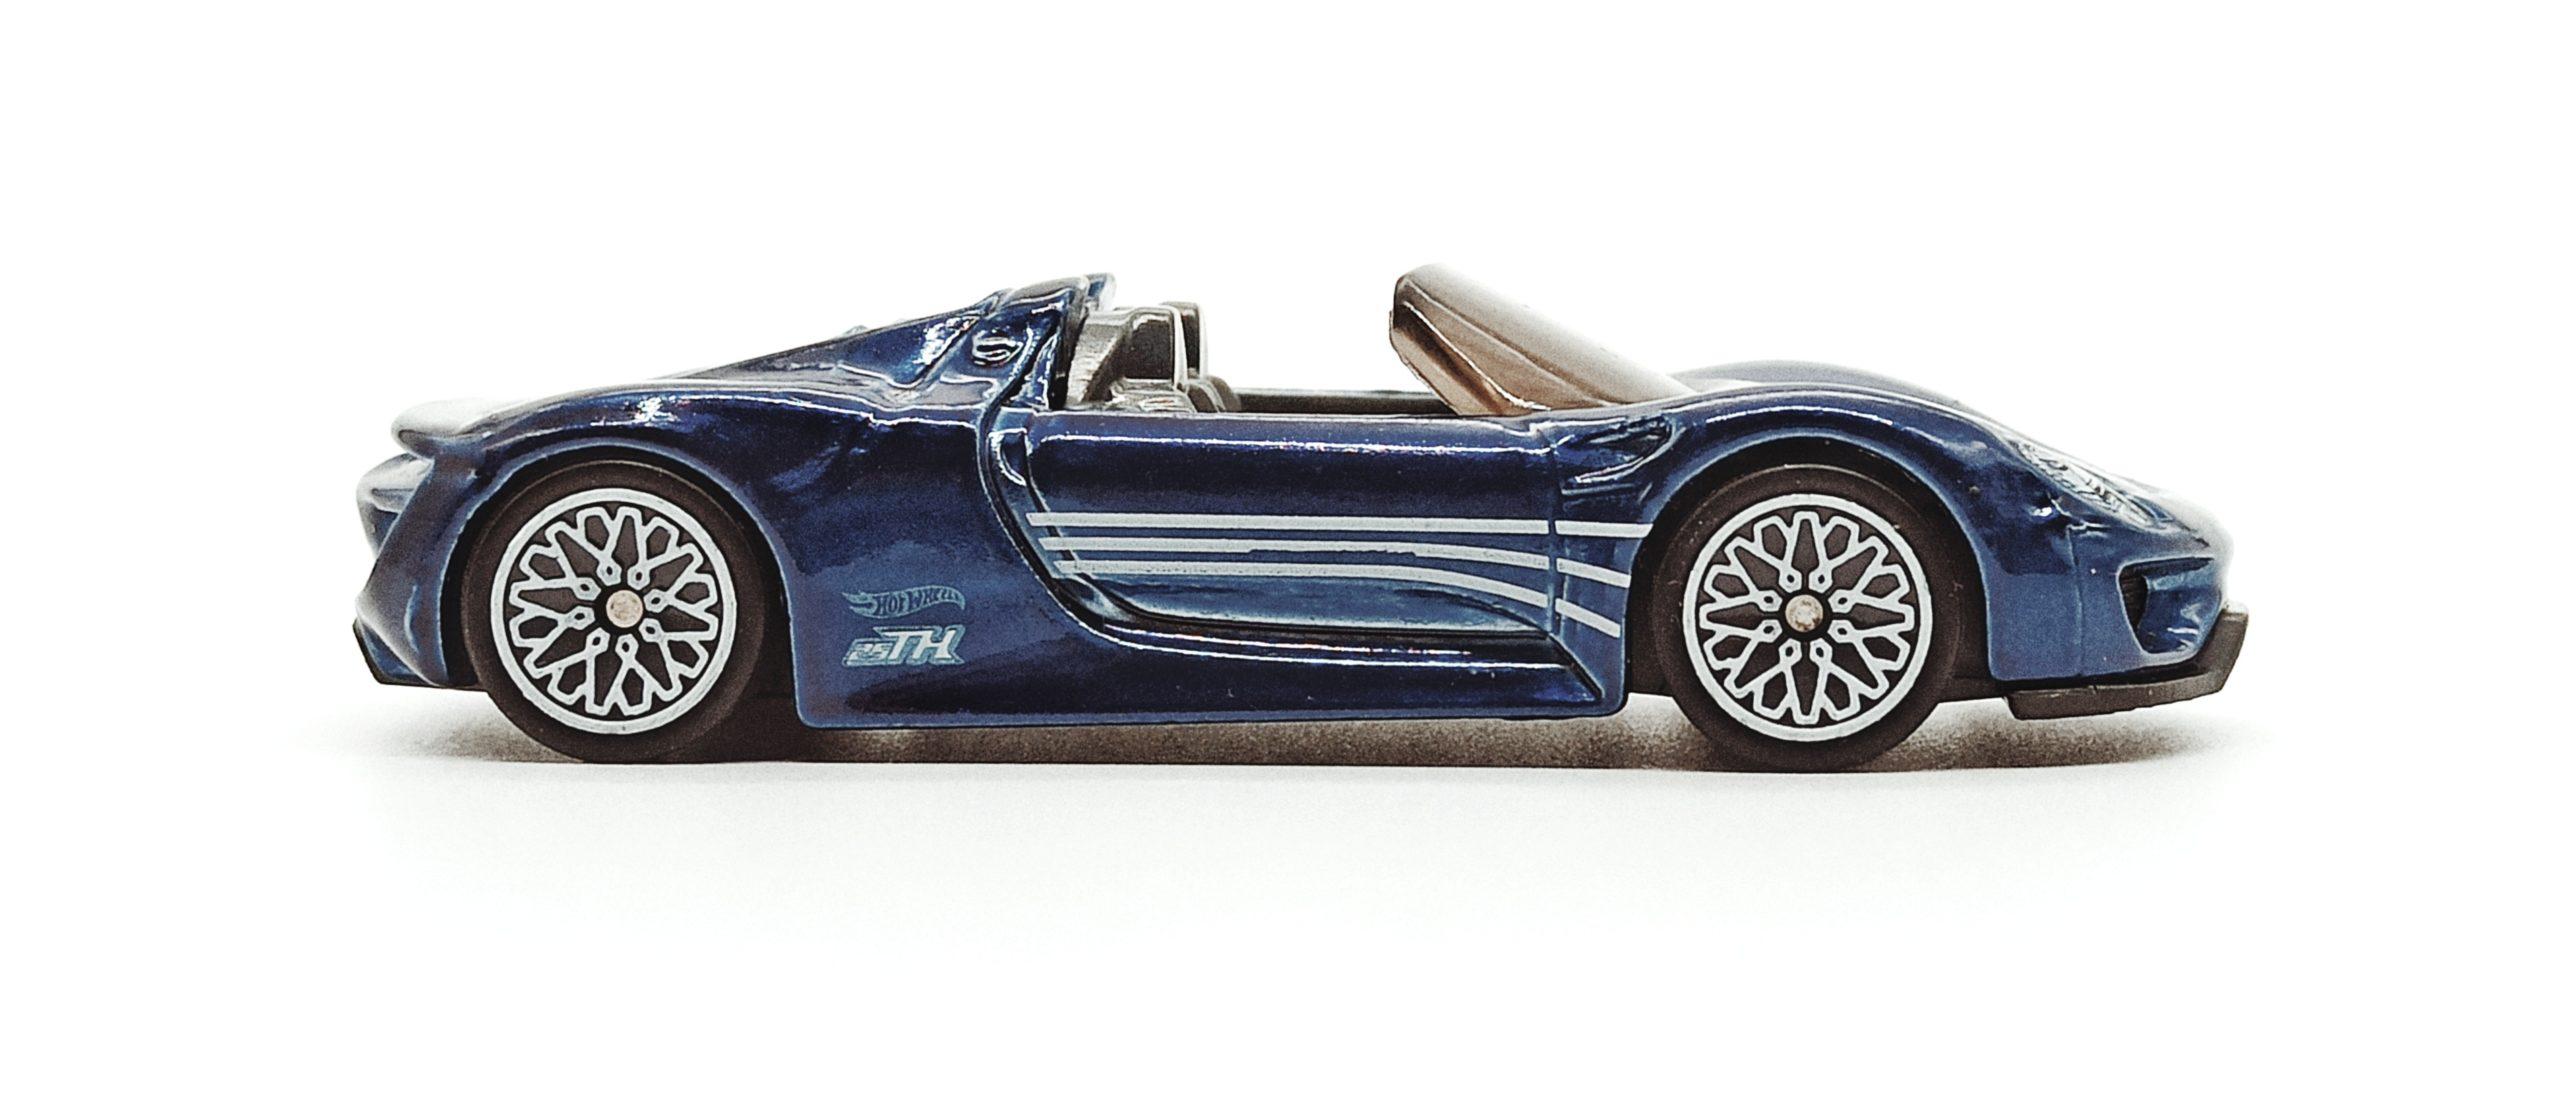 Hot Wheels Porsche 918 Spyder (2018 model) (GHG26) 2020 (94/250) Porsche (5/5) spectraflame blue Super Treasure Hunt (STH) side